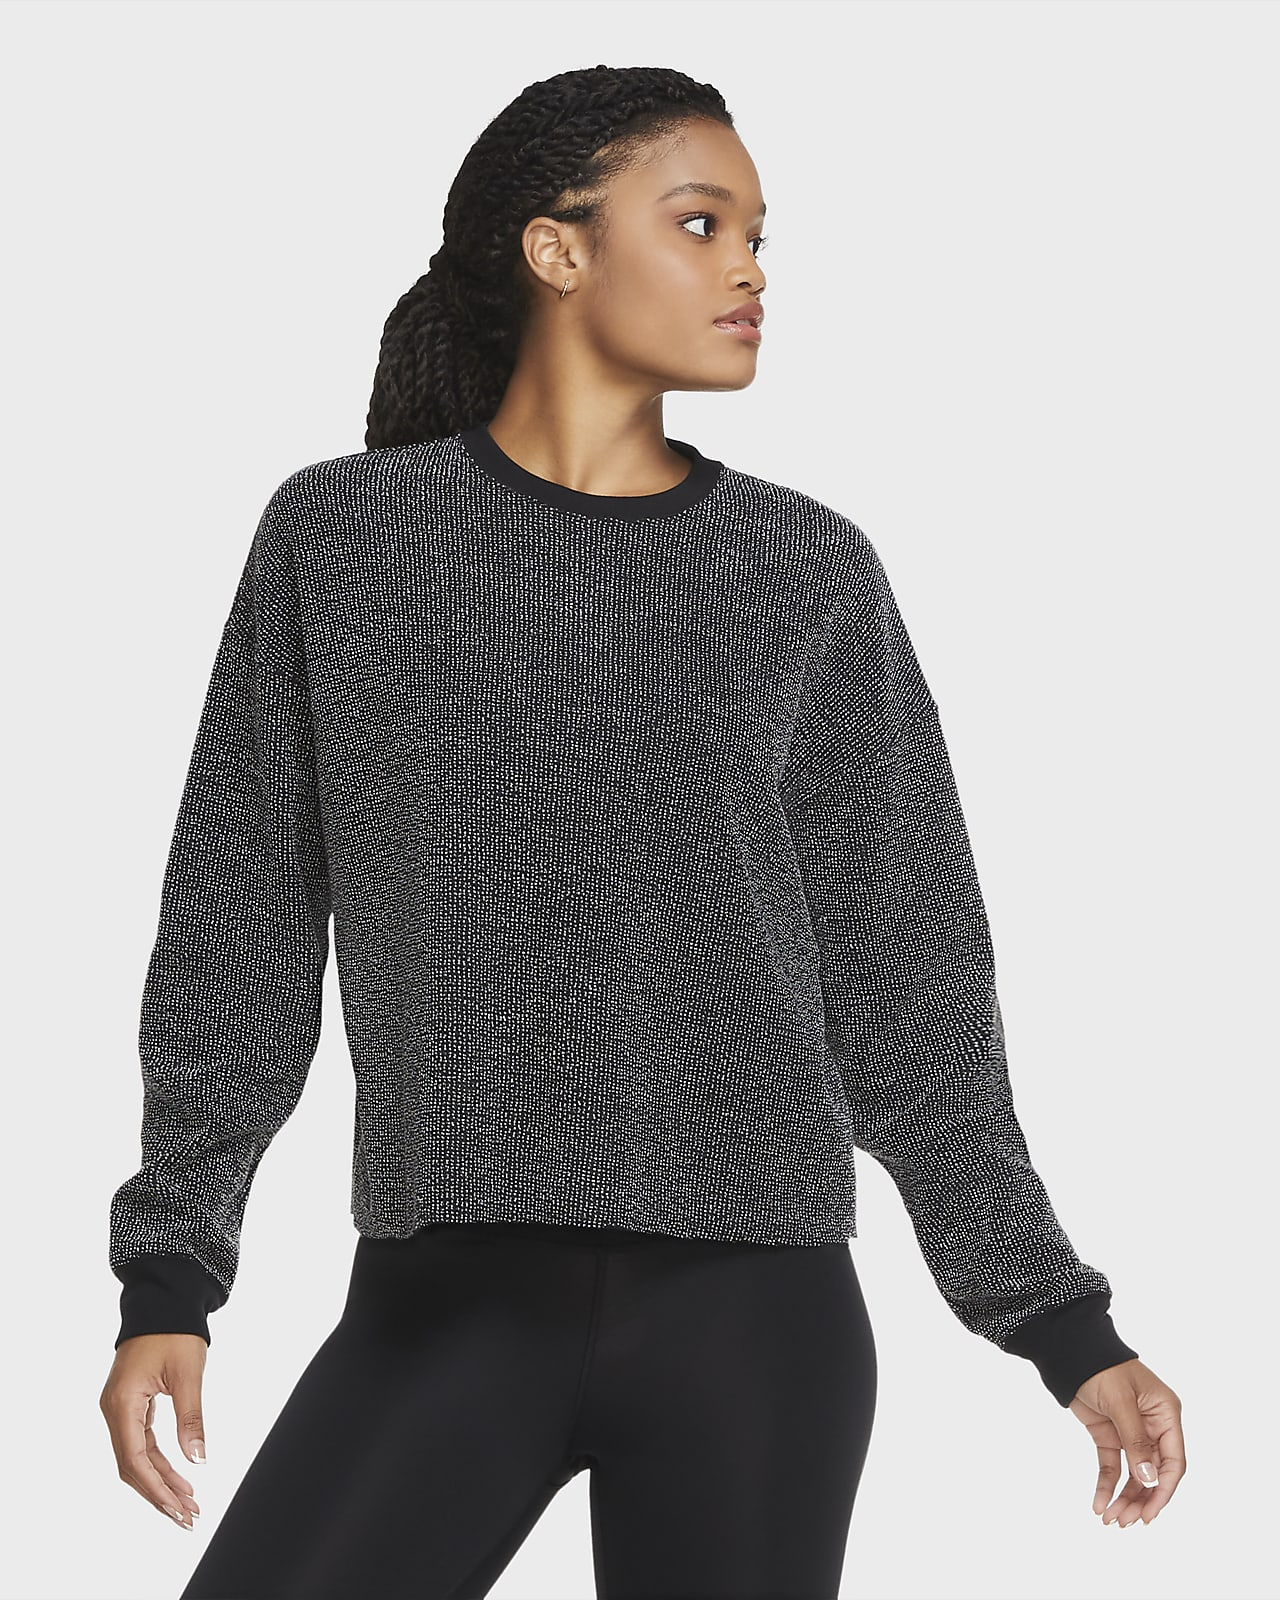 Nike Yoga Damen-Rundhalsshirt